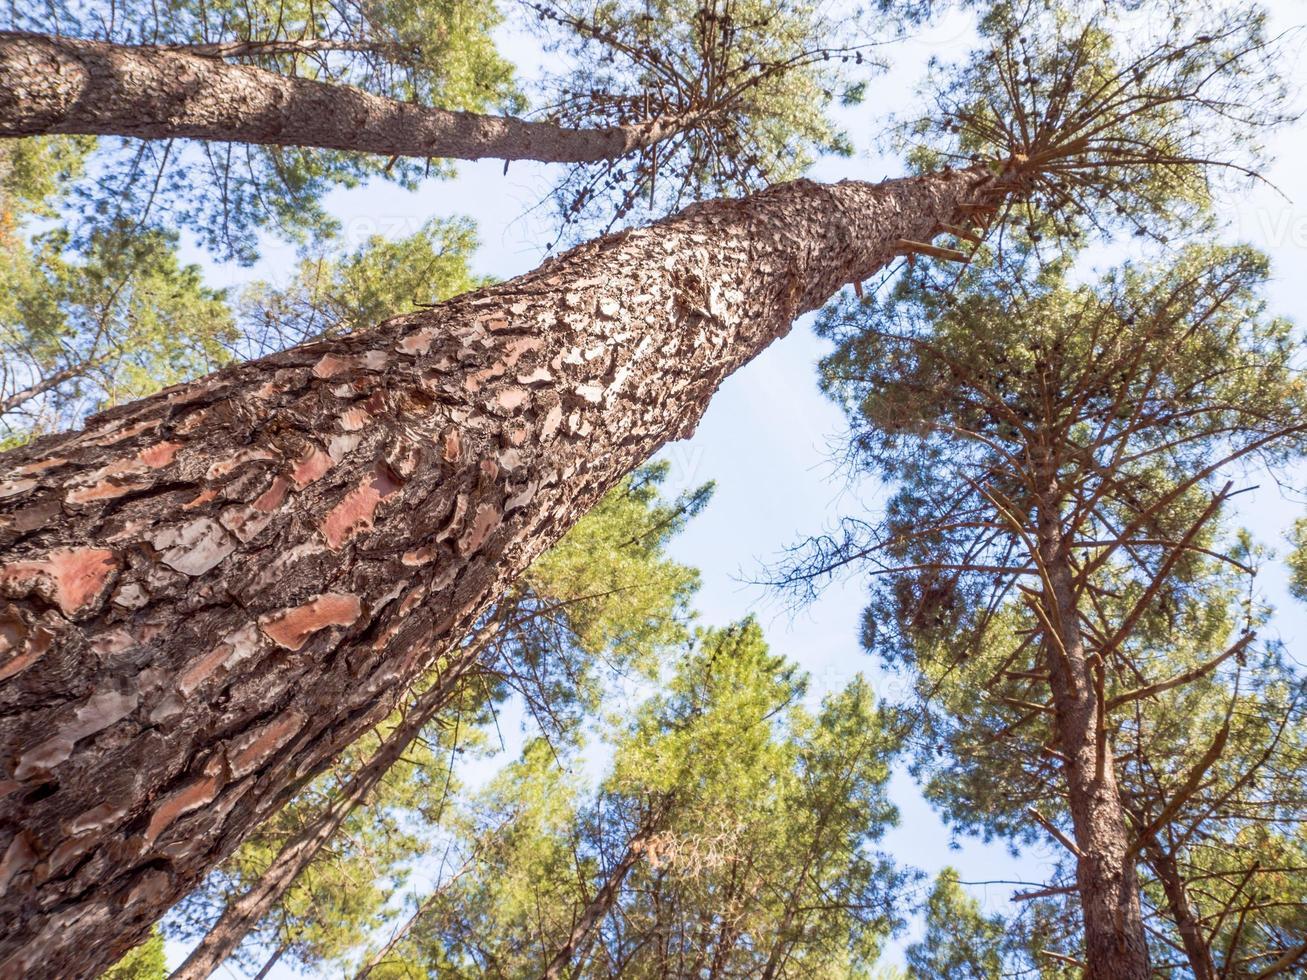 cortex pine close up photo